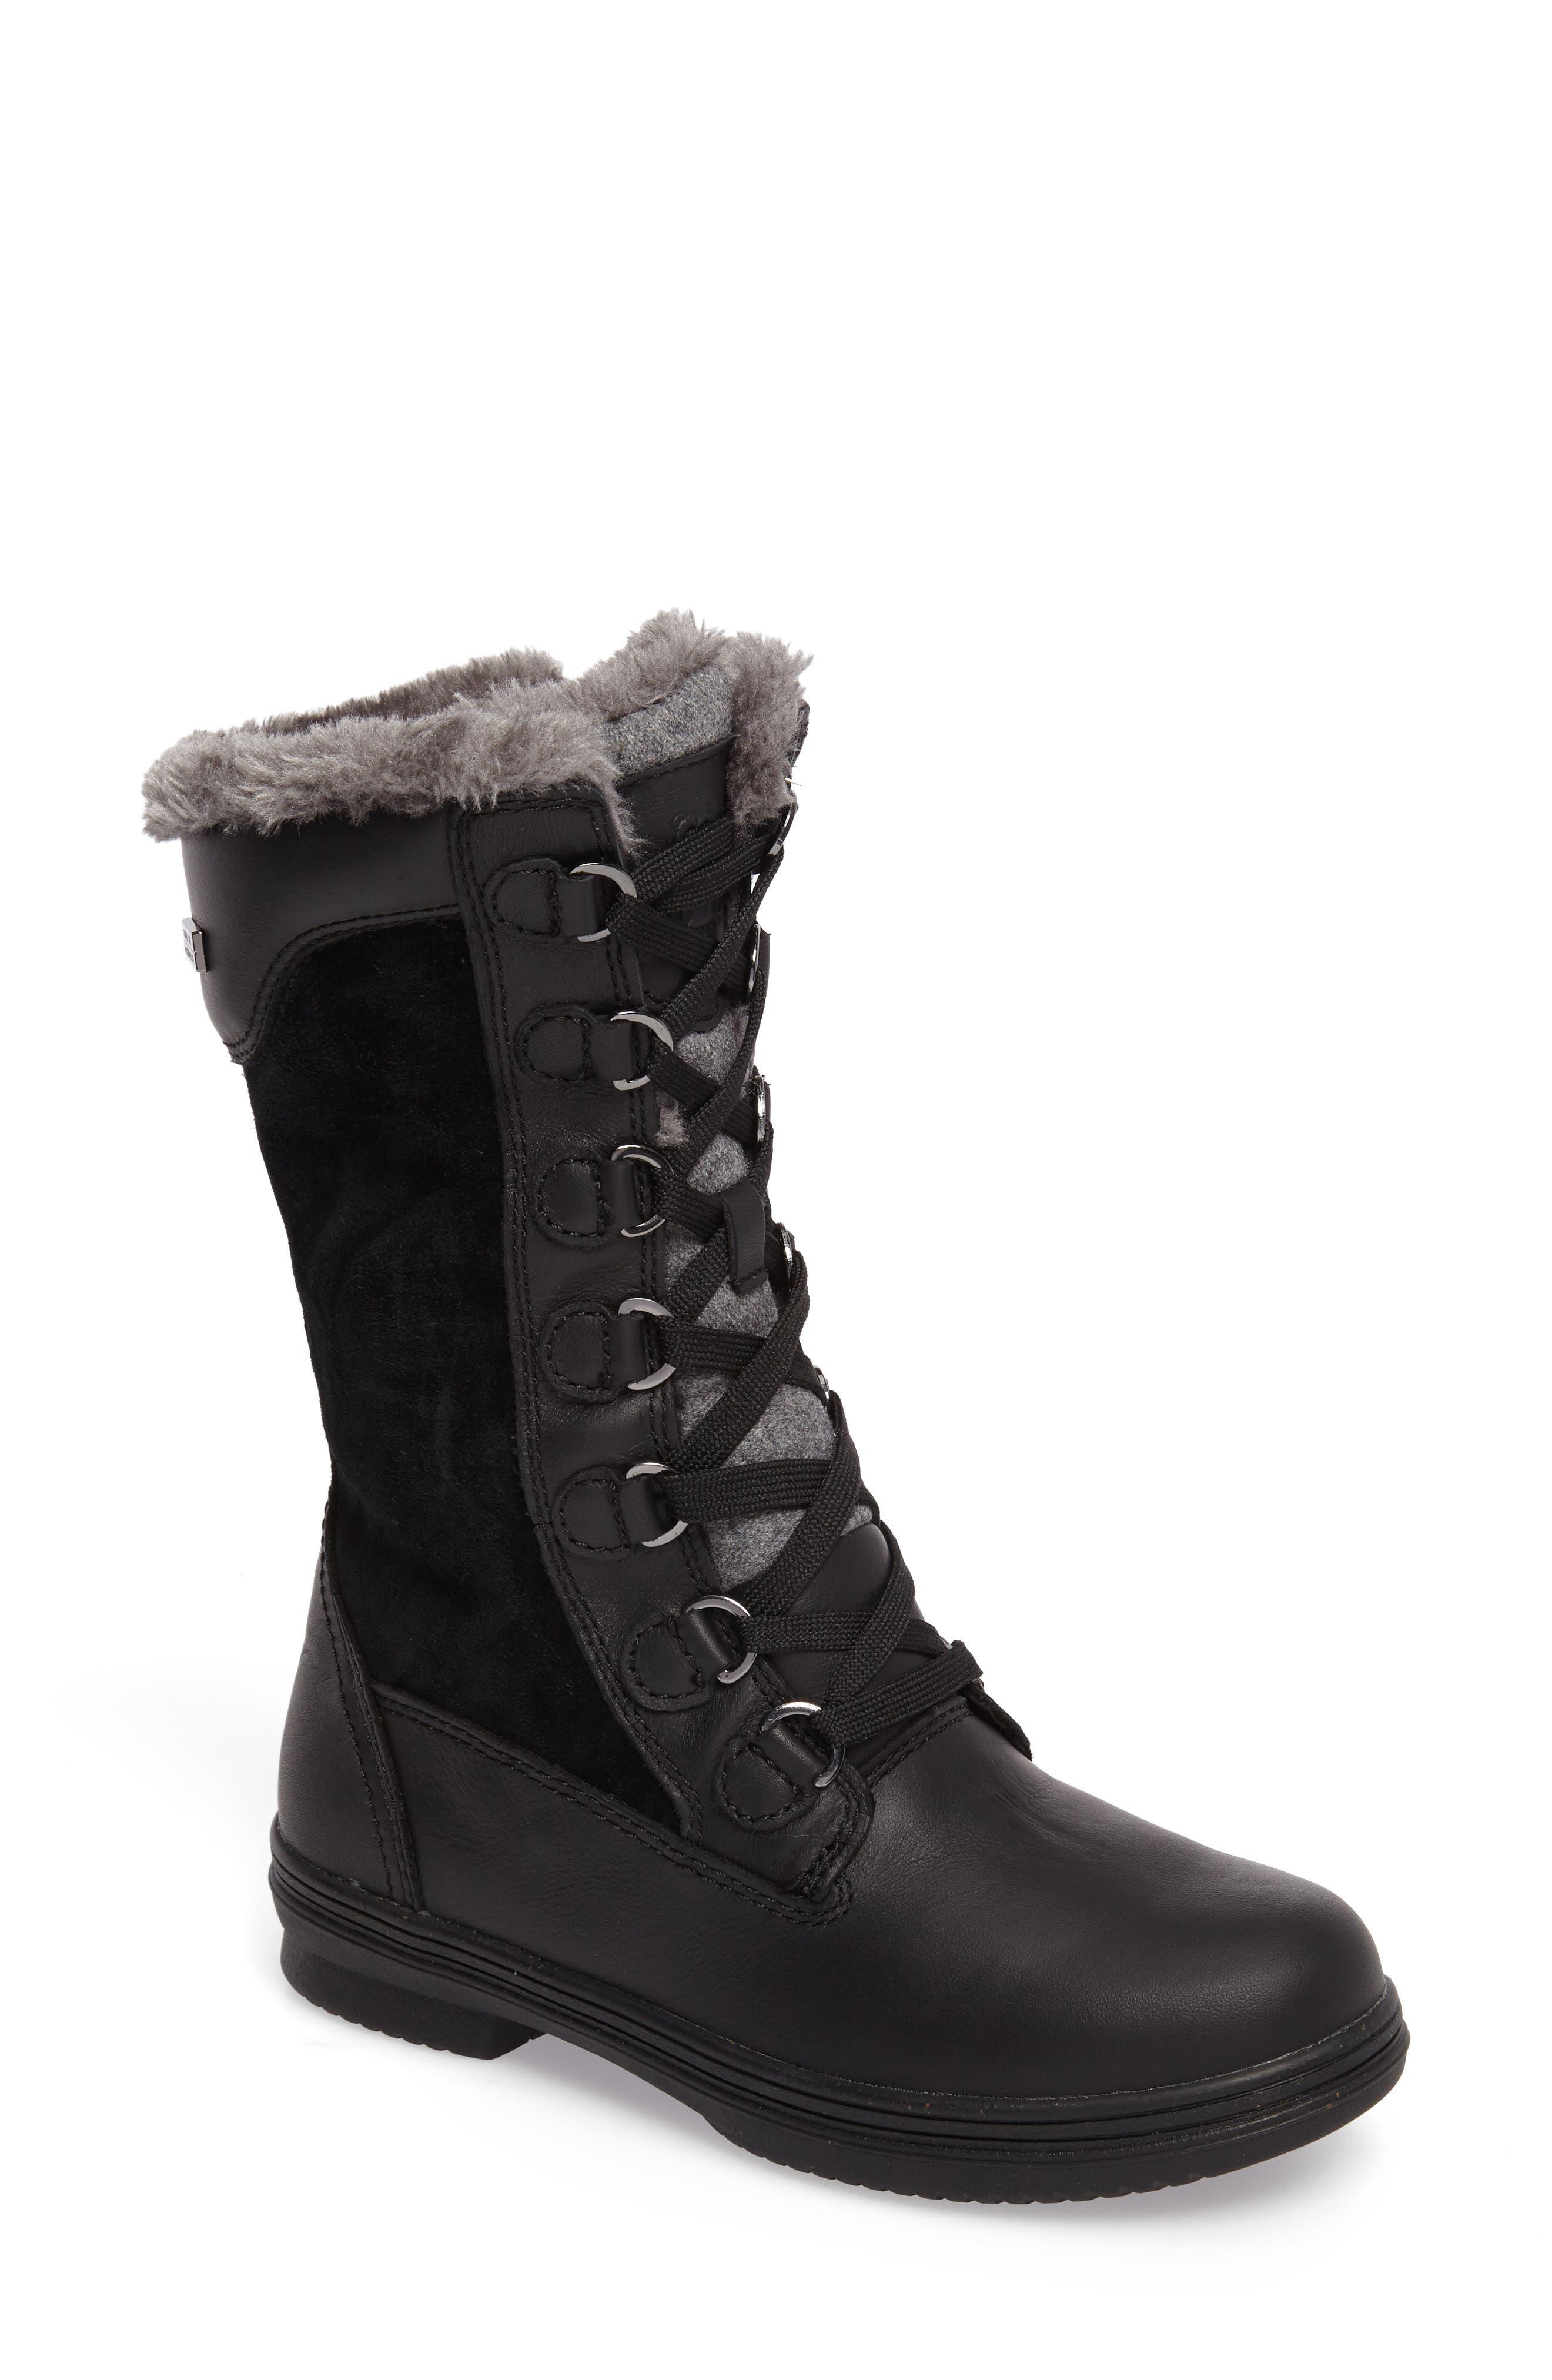 Glata Waterproof Boot,                         Main,                         color, Black Leather